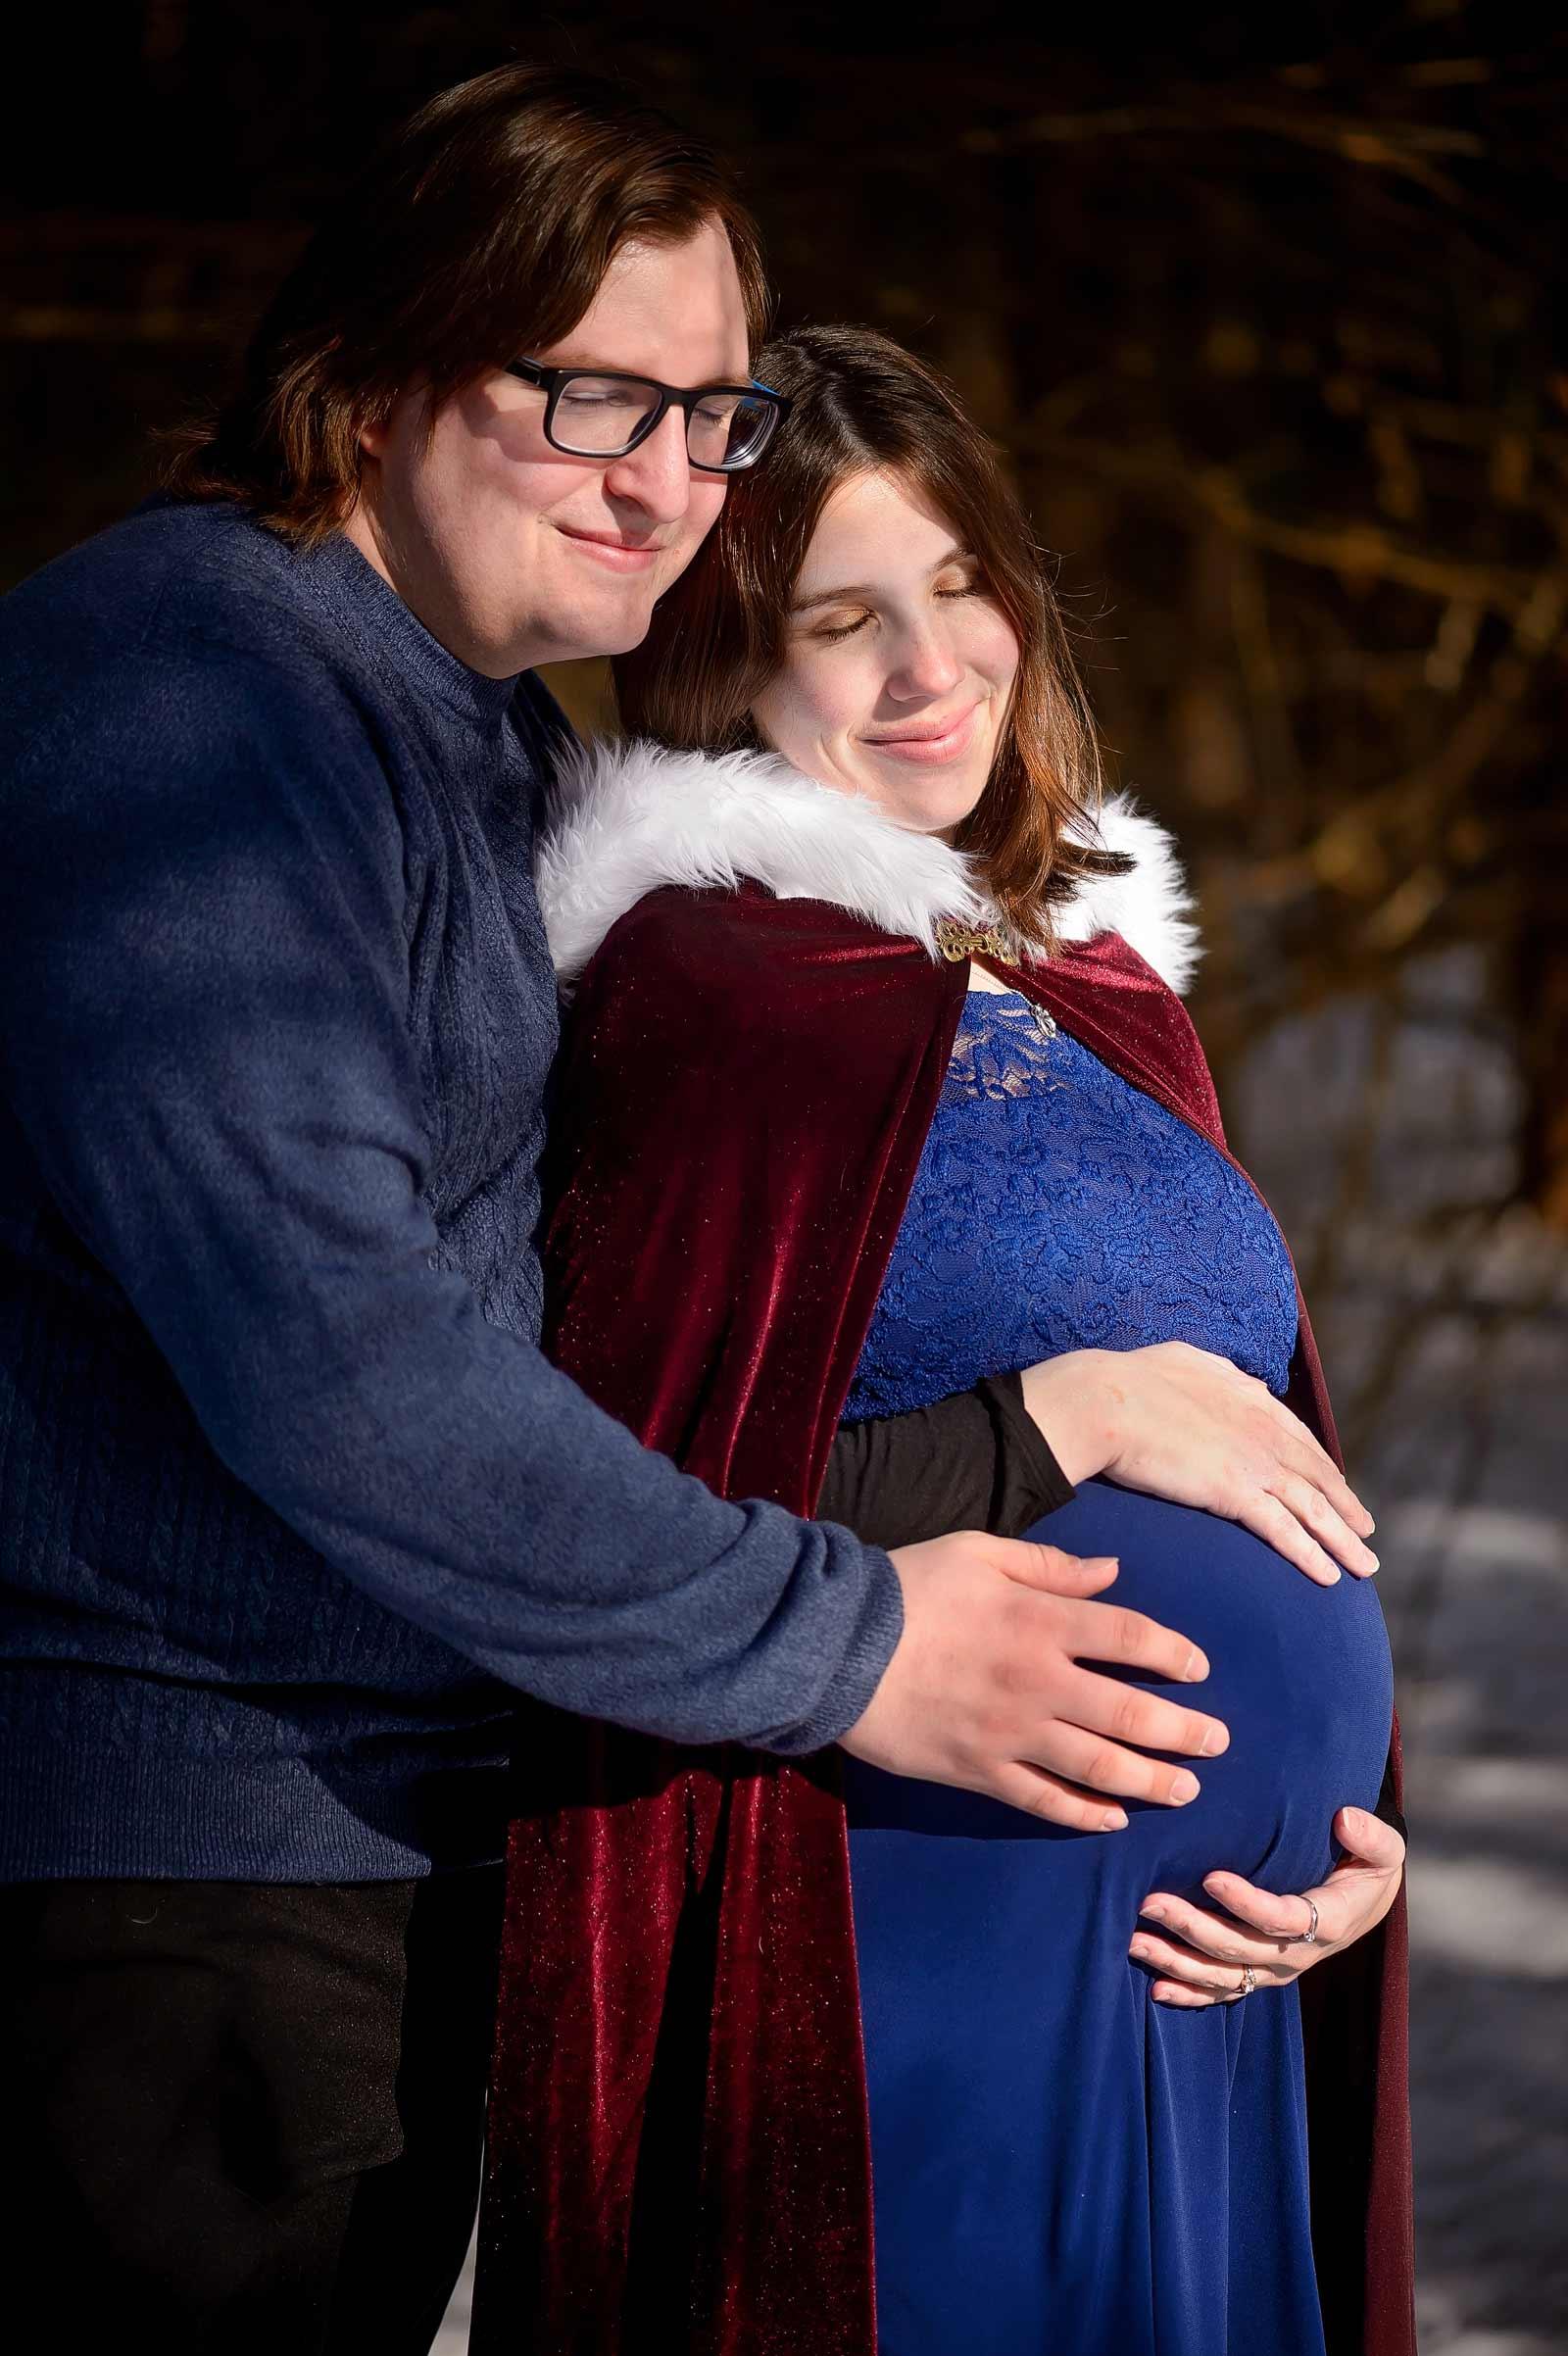 DeannaJustin-maternity-sneakpeek-06